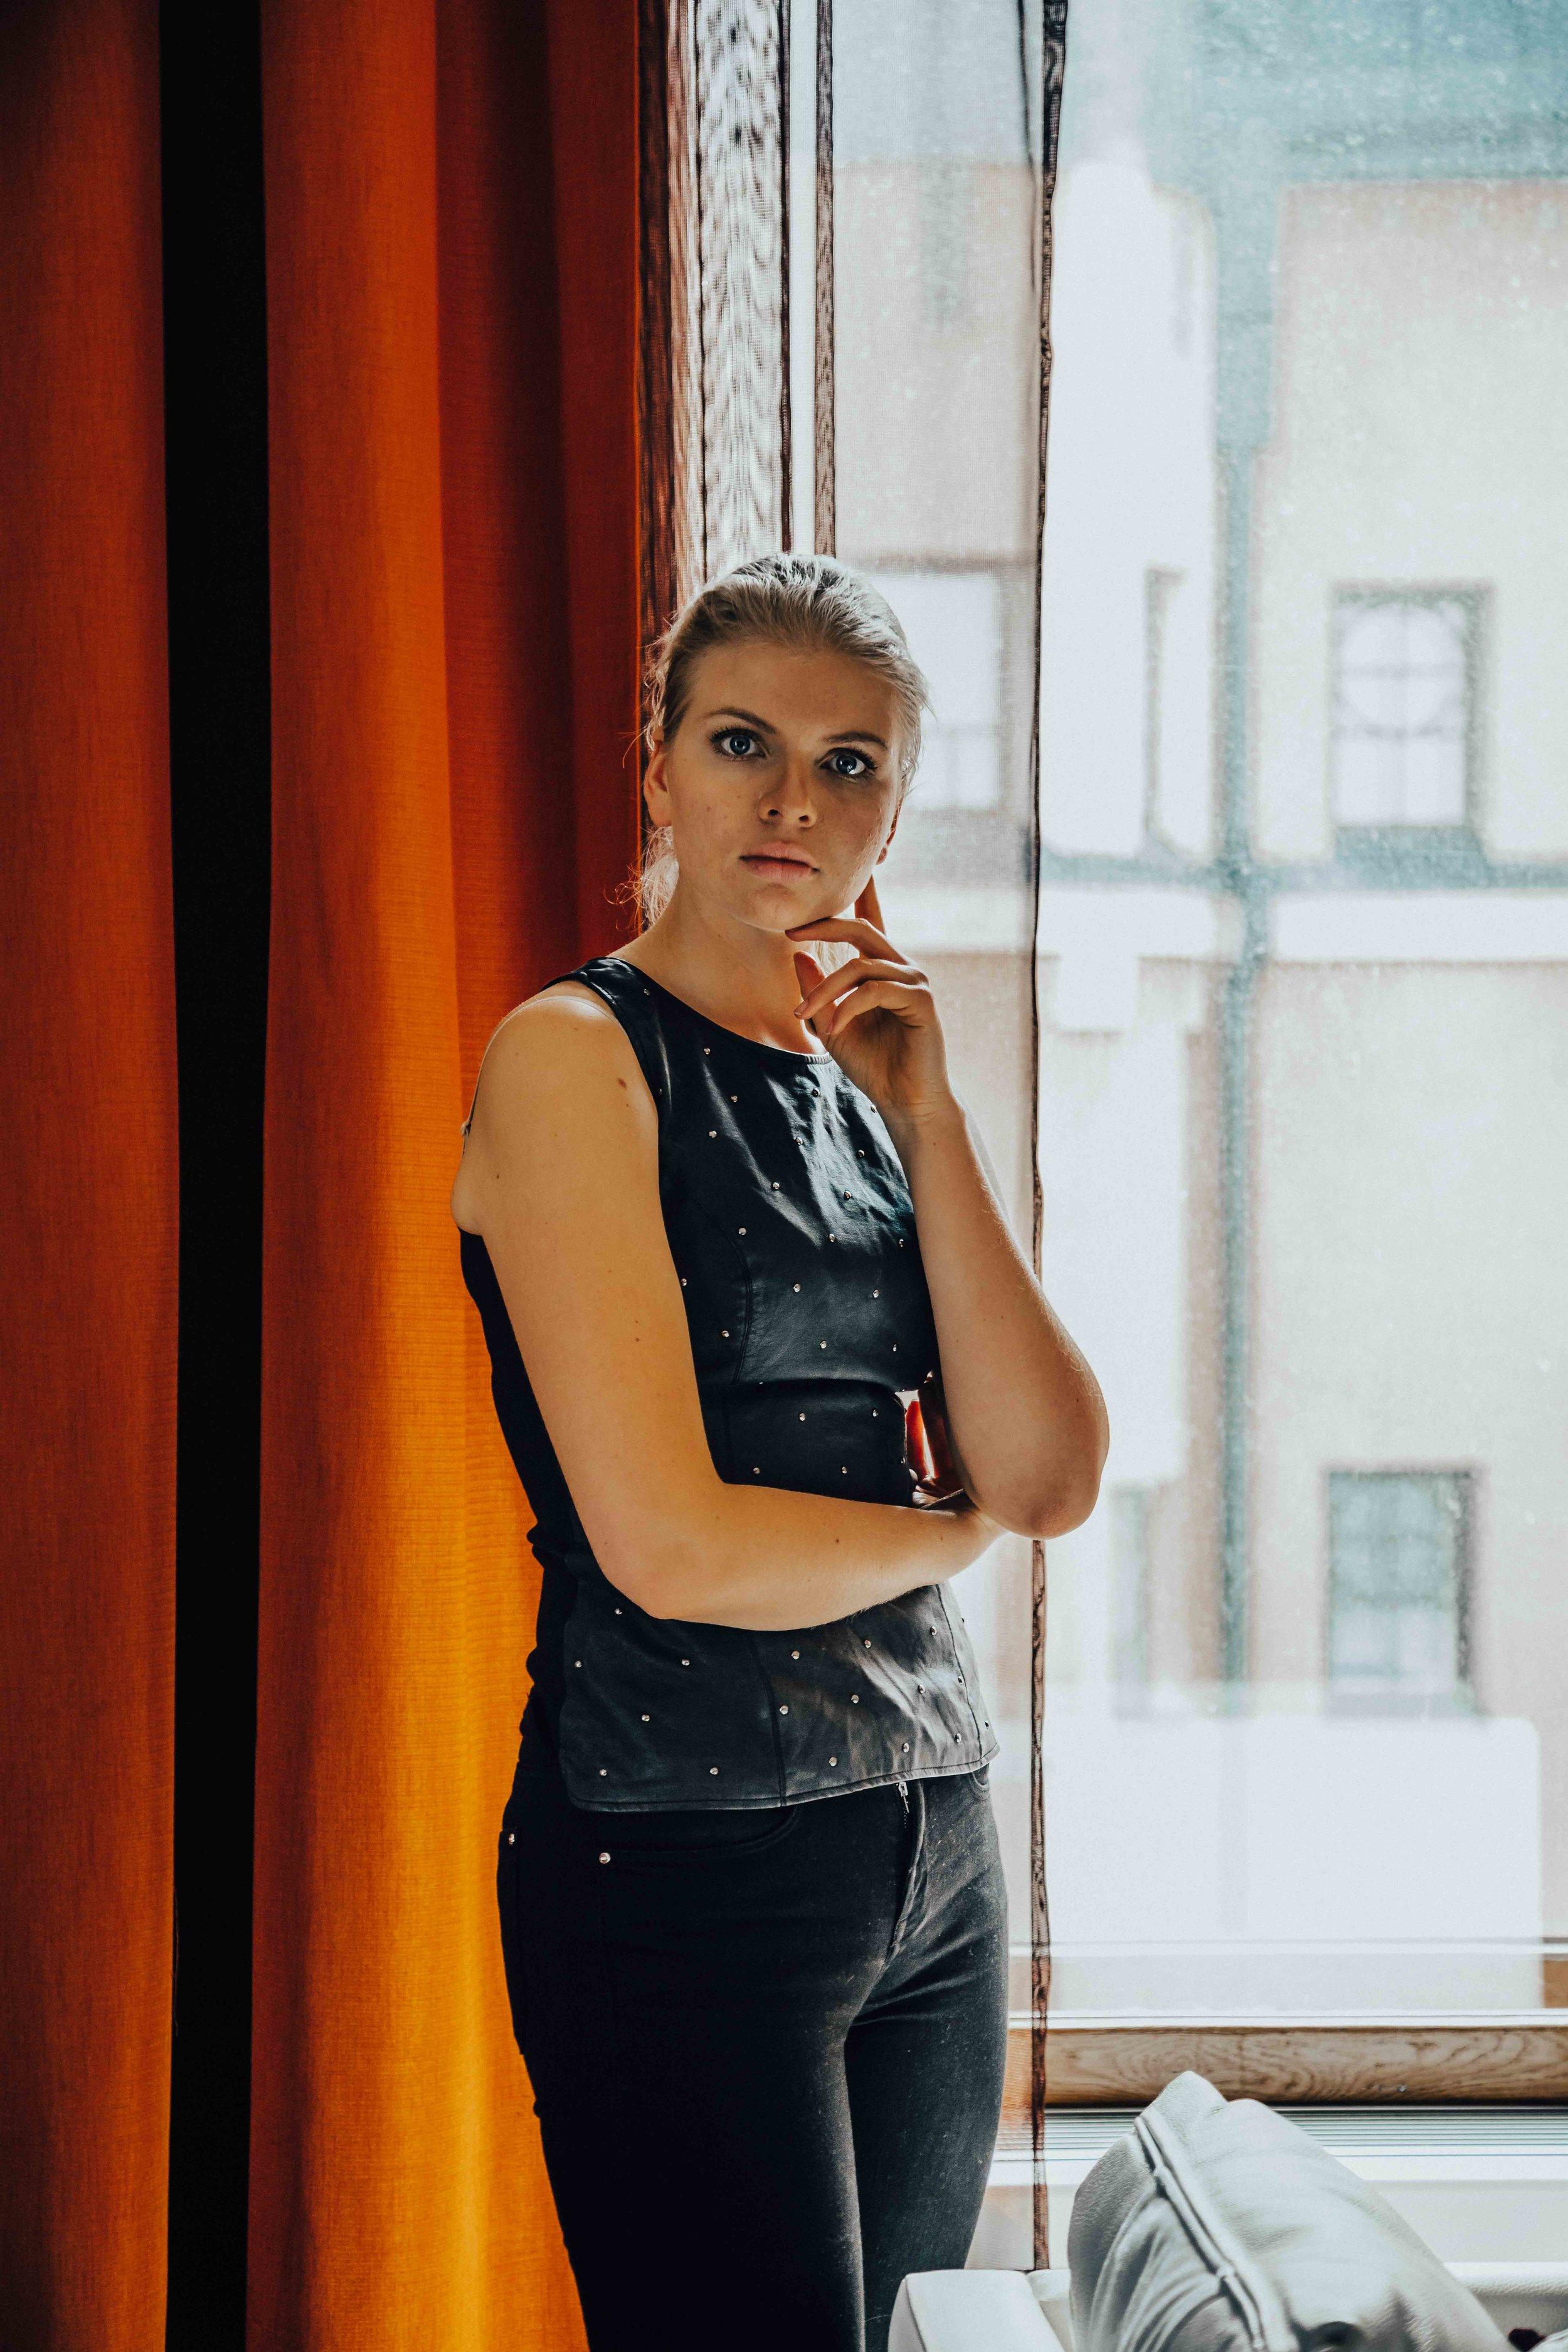 Paula Potry maria Mr Classic Sug Sean Hackett London POLO, Helsinki raddisonblu.jpg-3.jpg